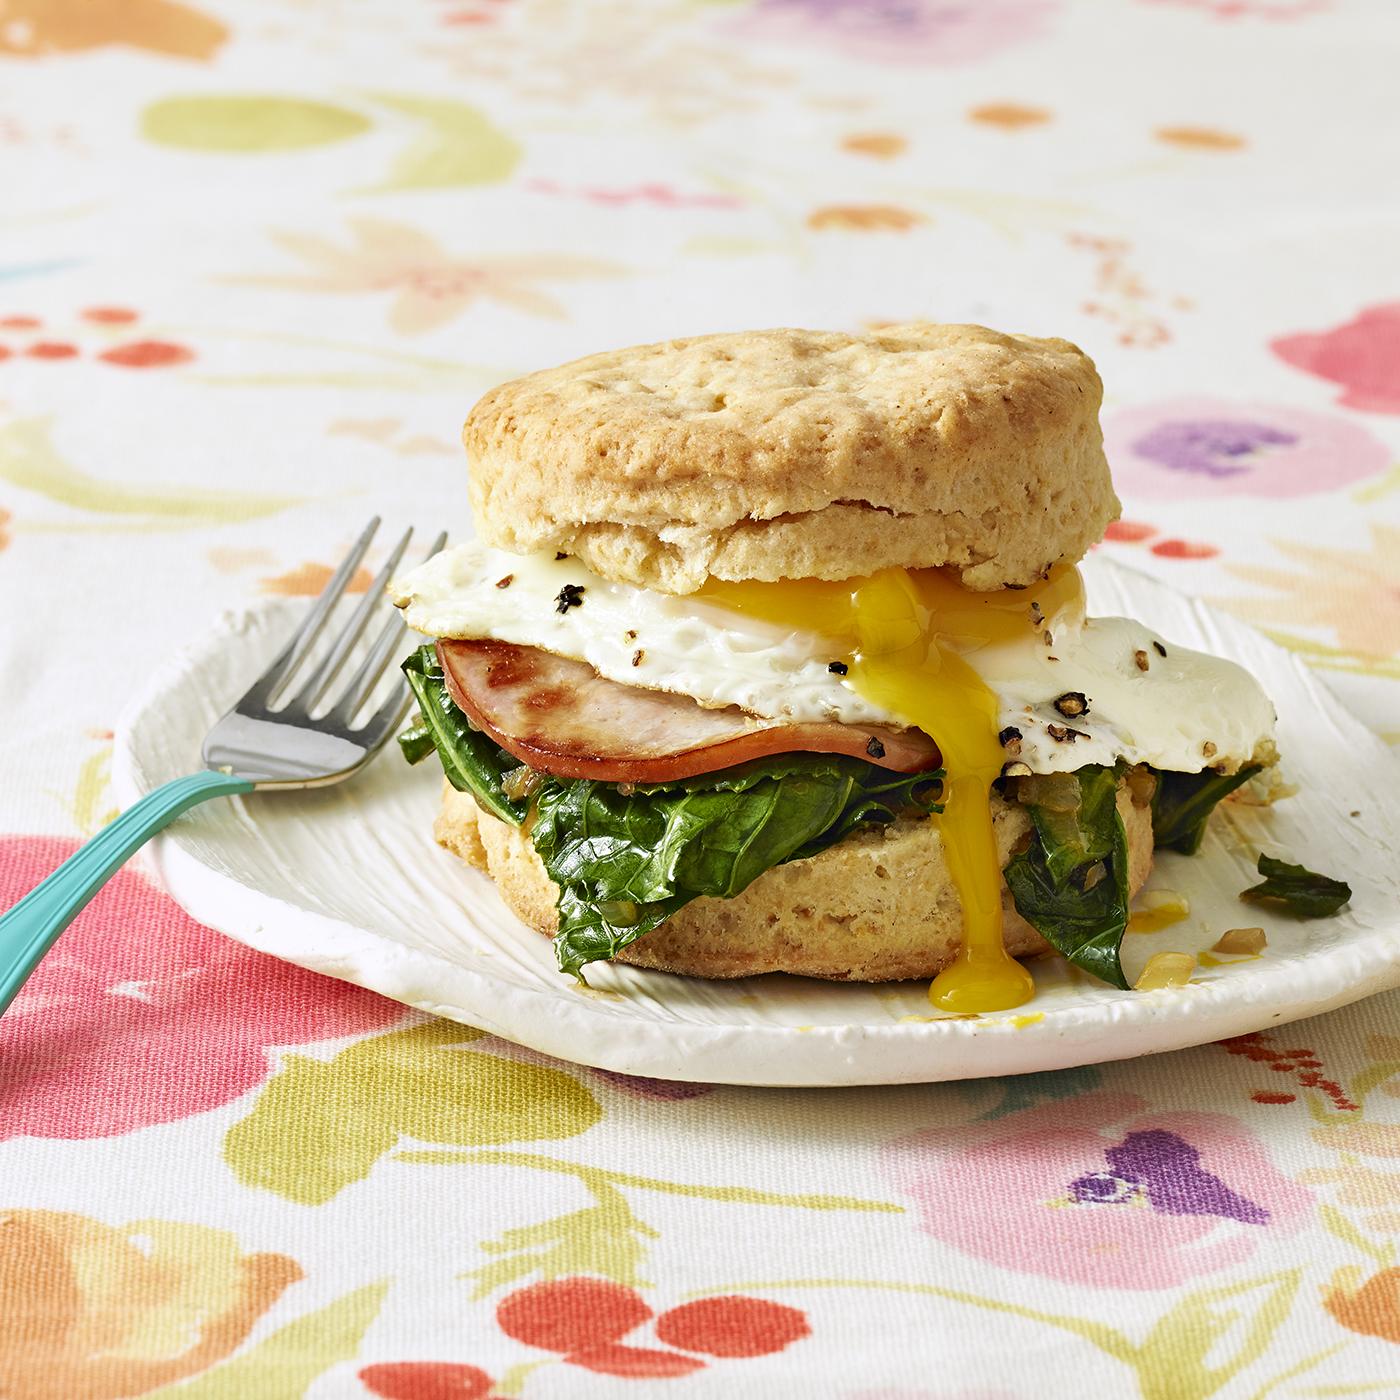 Greens, Eggs & Ham Biscuits